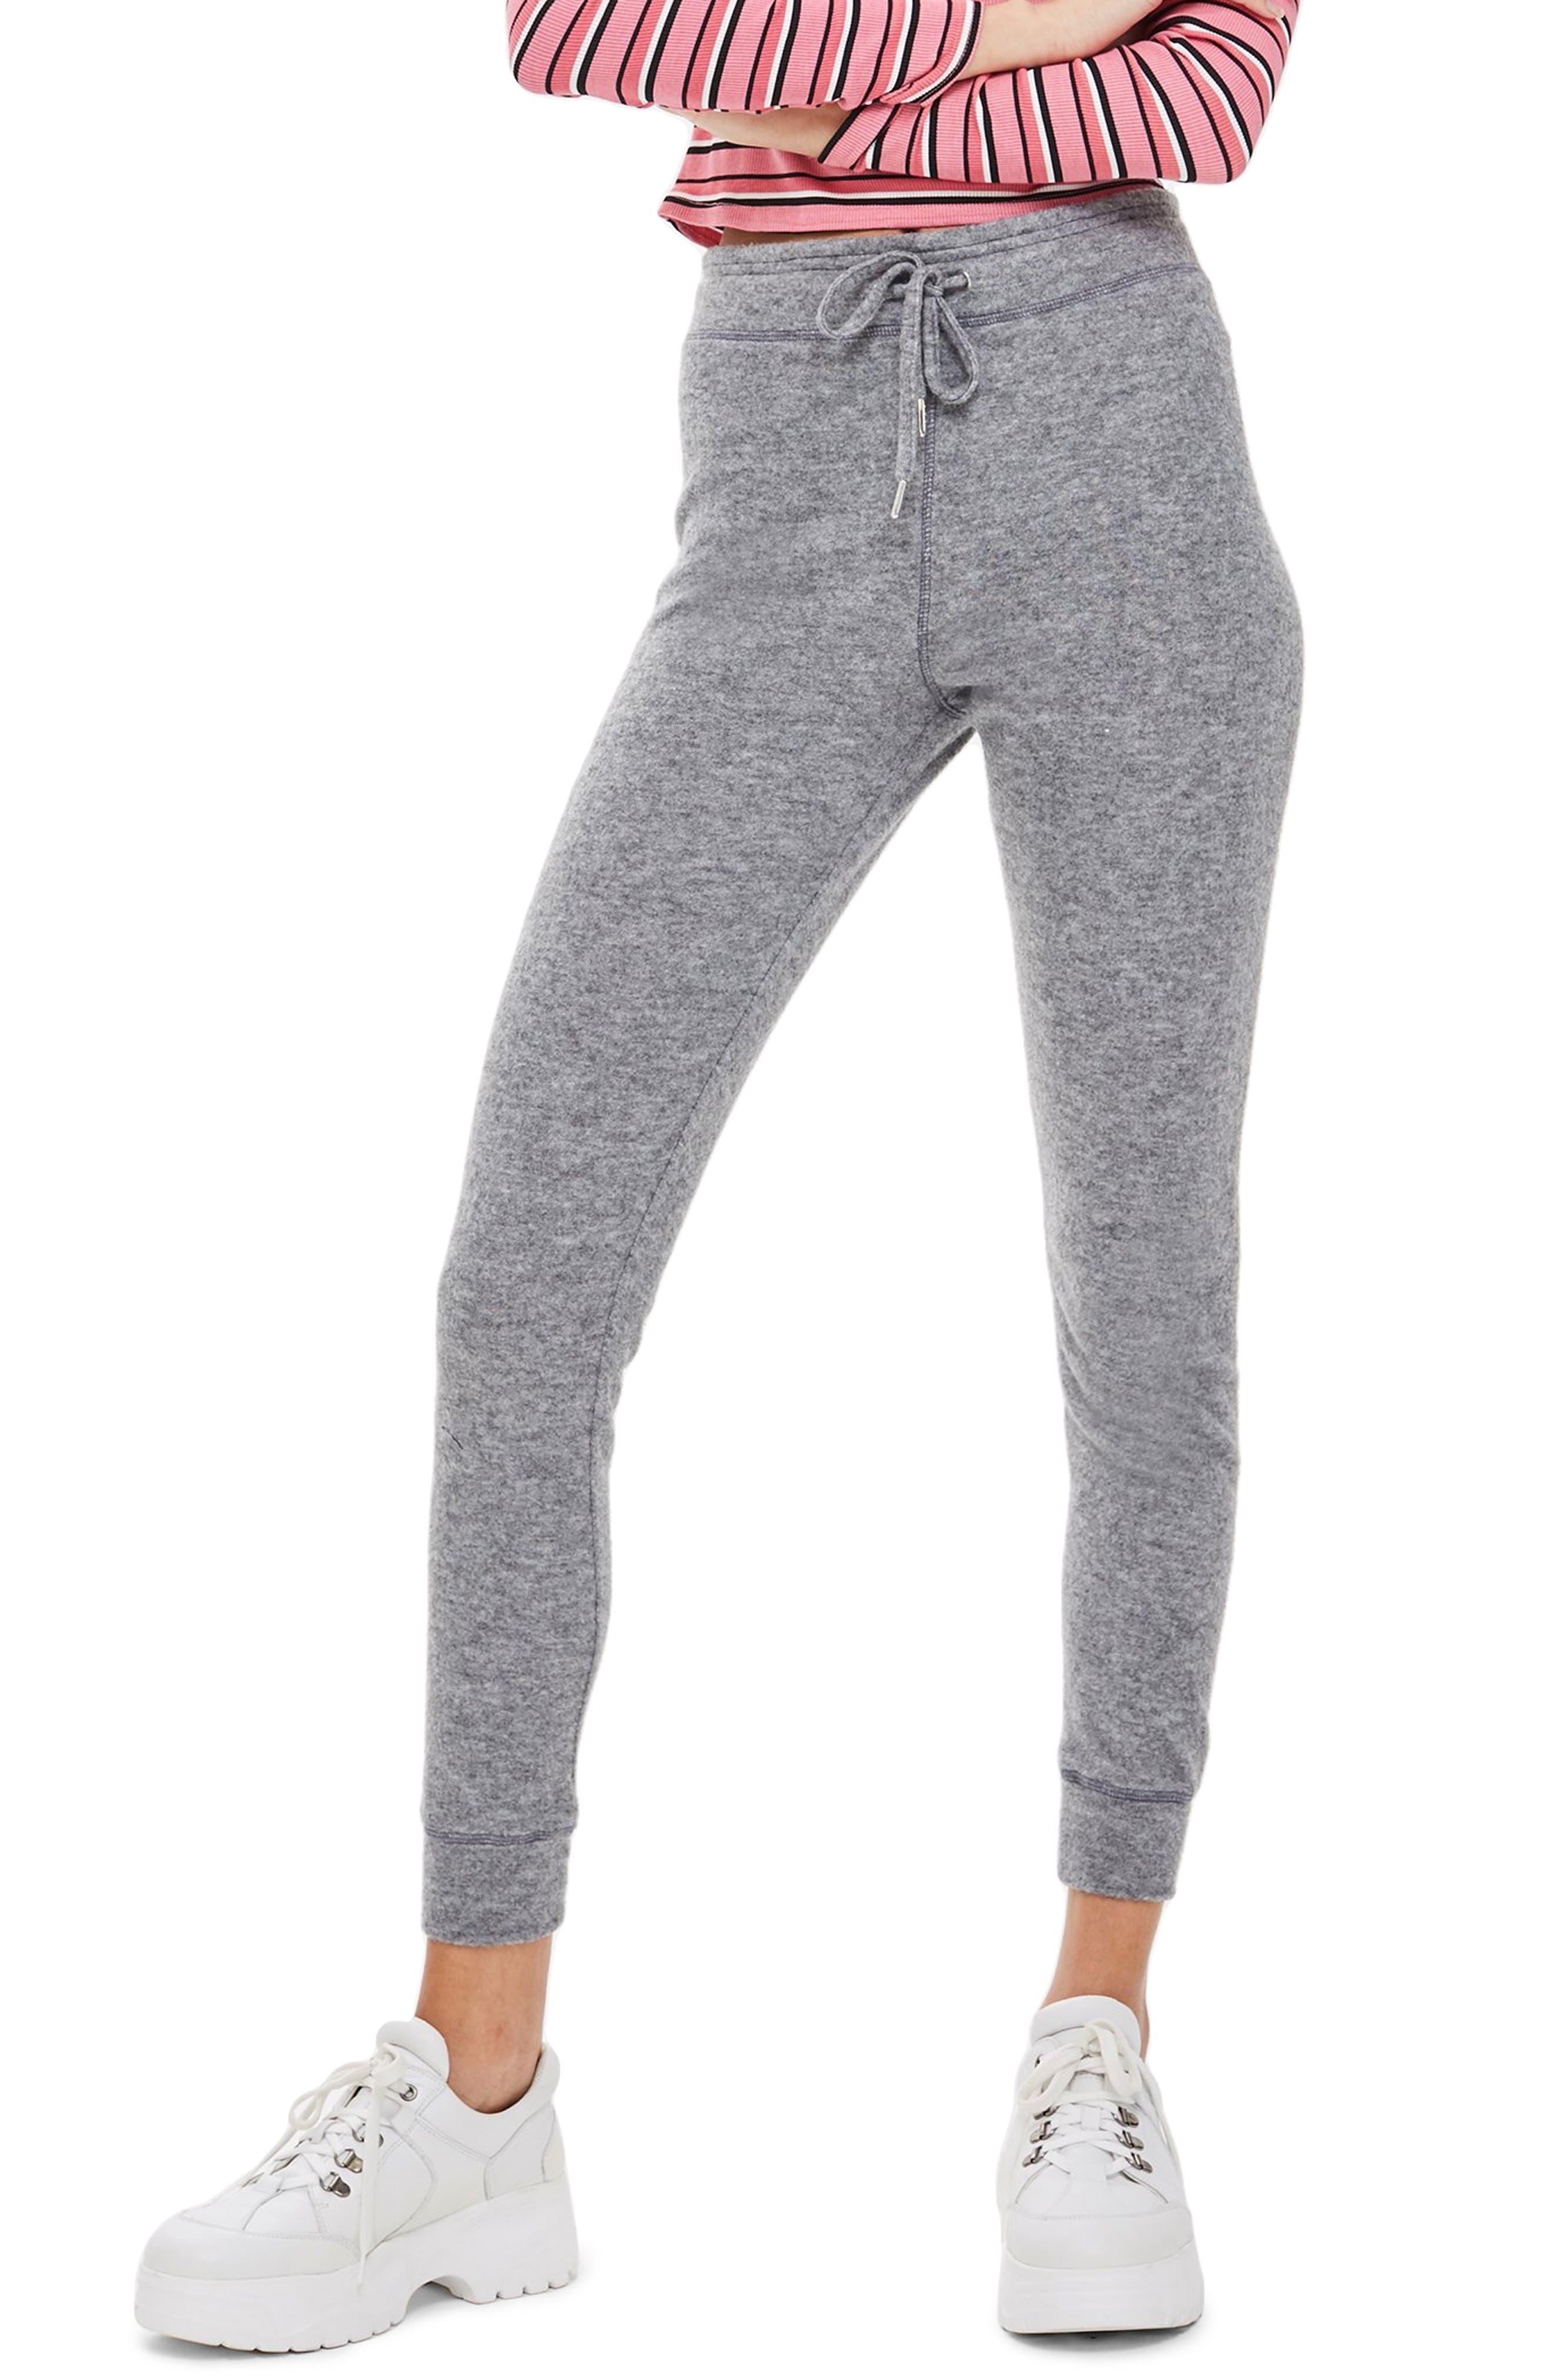 Brushed Super Skinny Jogger Pants,                         Main,                         color, GREY MARL